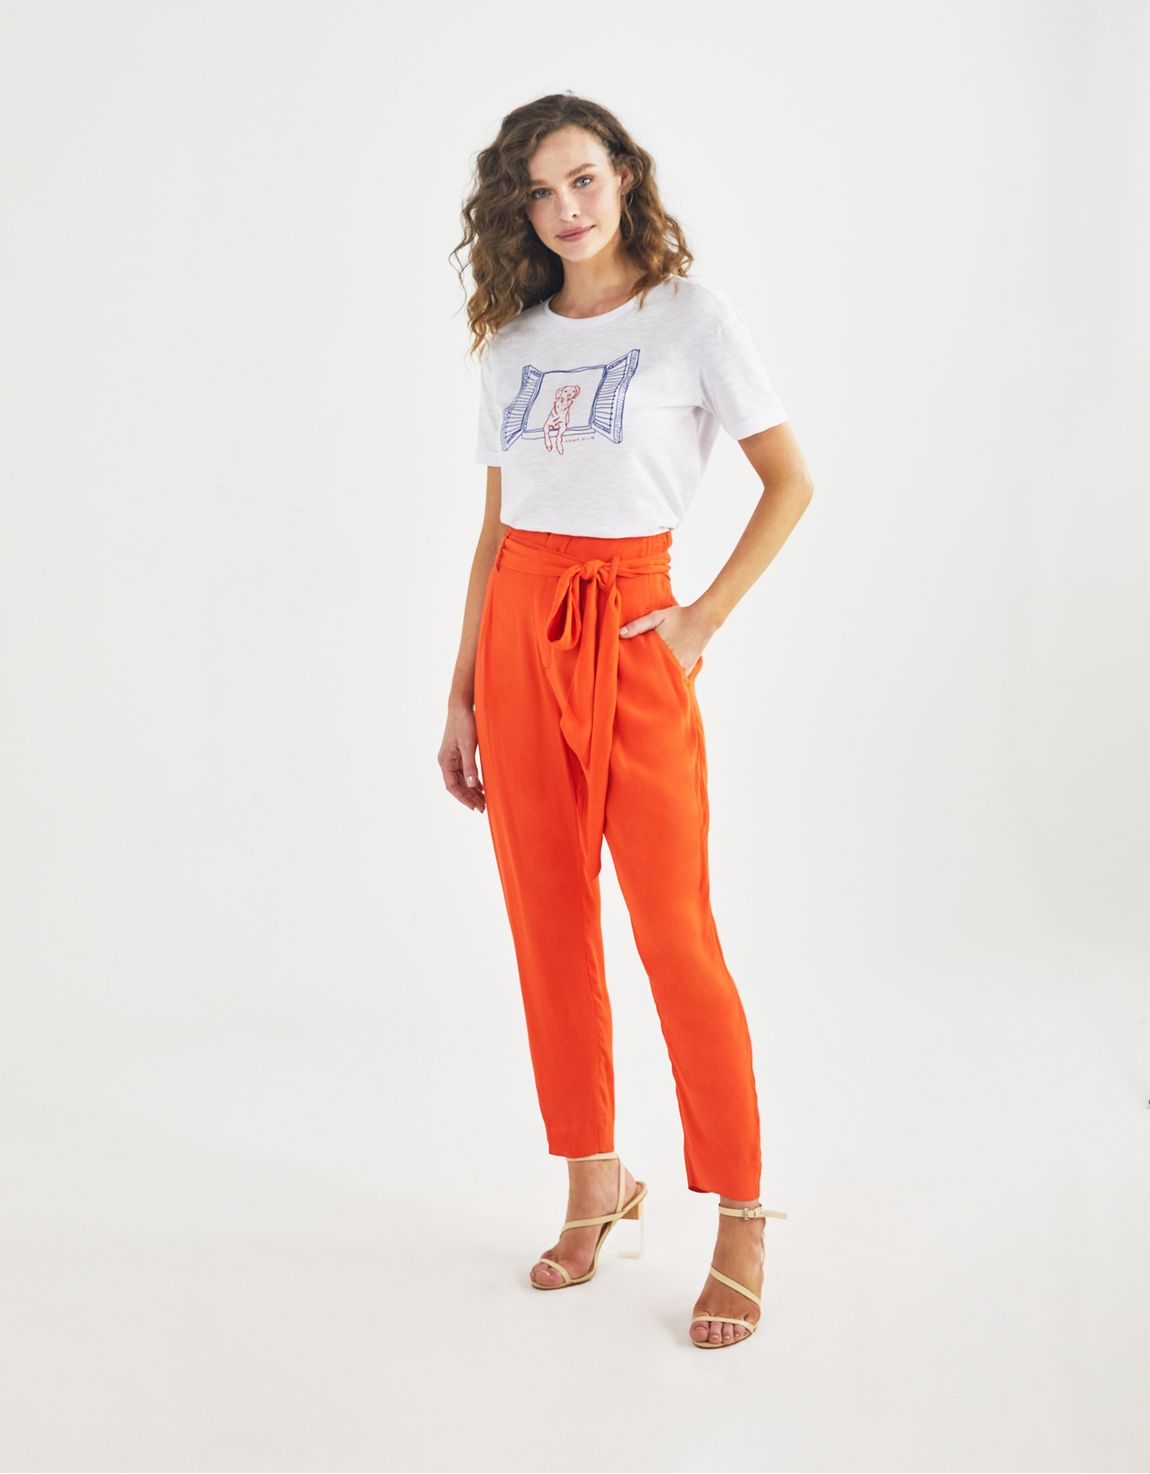 T-shirt aumigos catarina